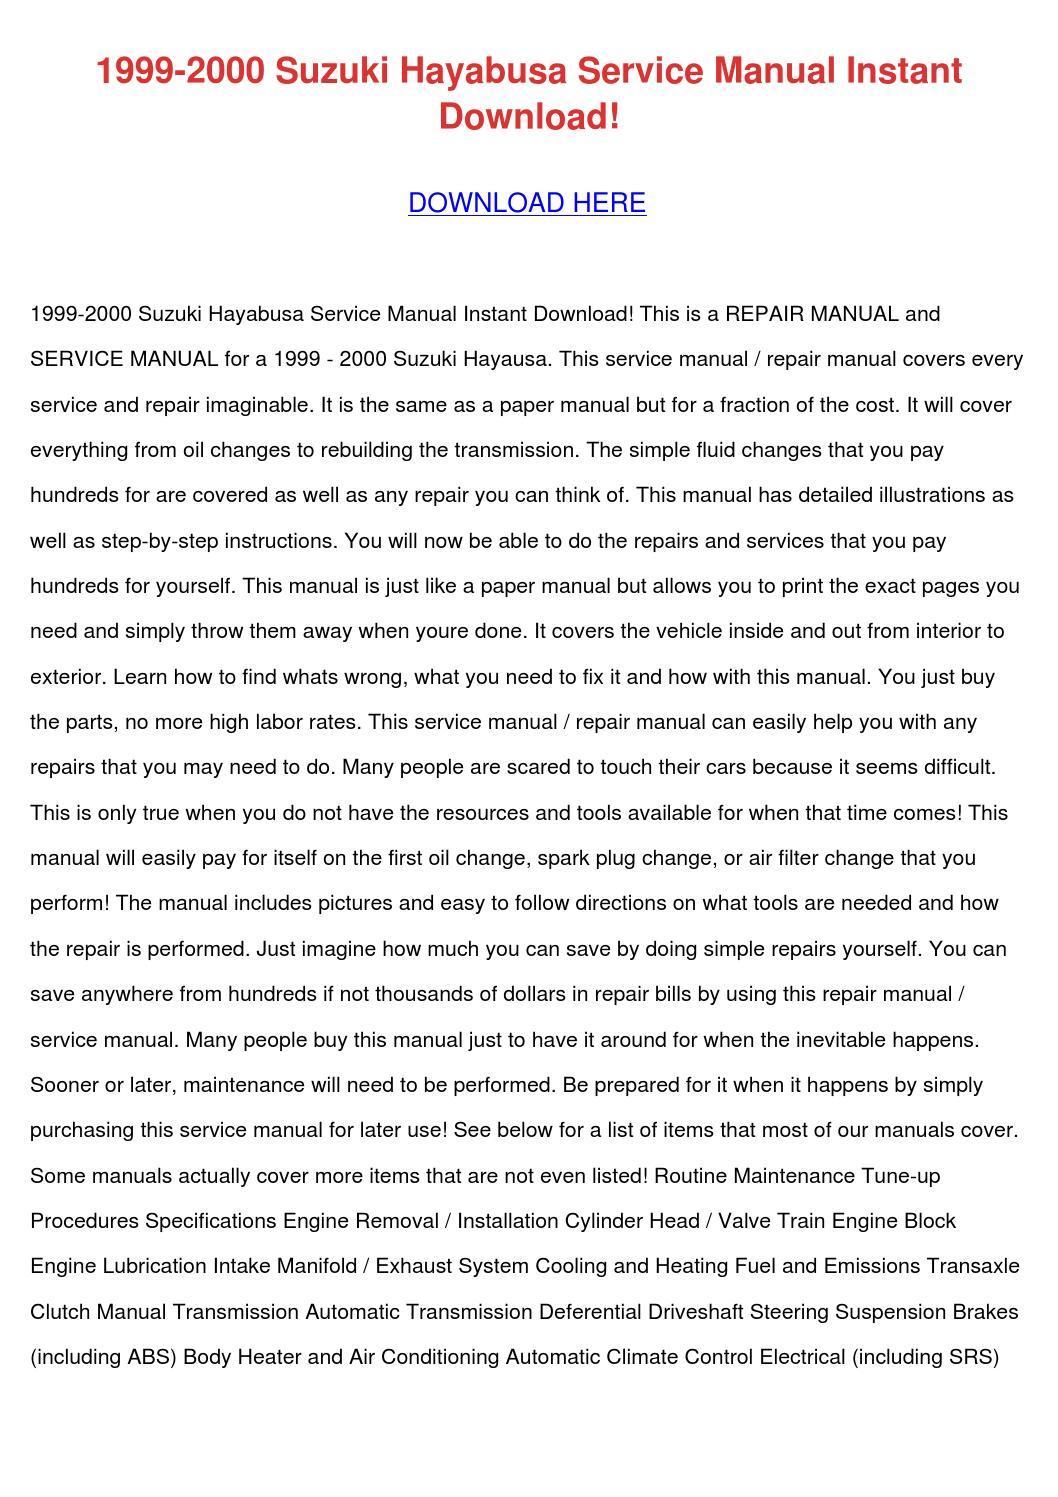 1999 2000 Suzuki Hayabusa Service Manual Inst by AngelicaWoodward - issuu